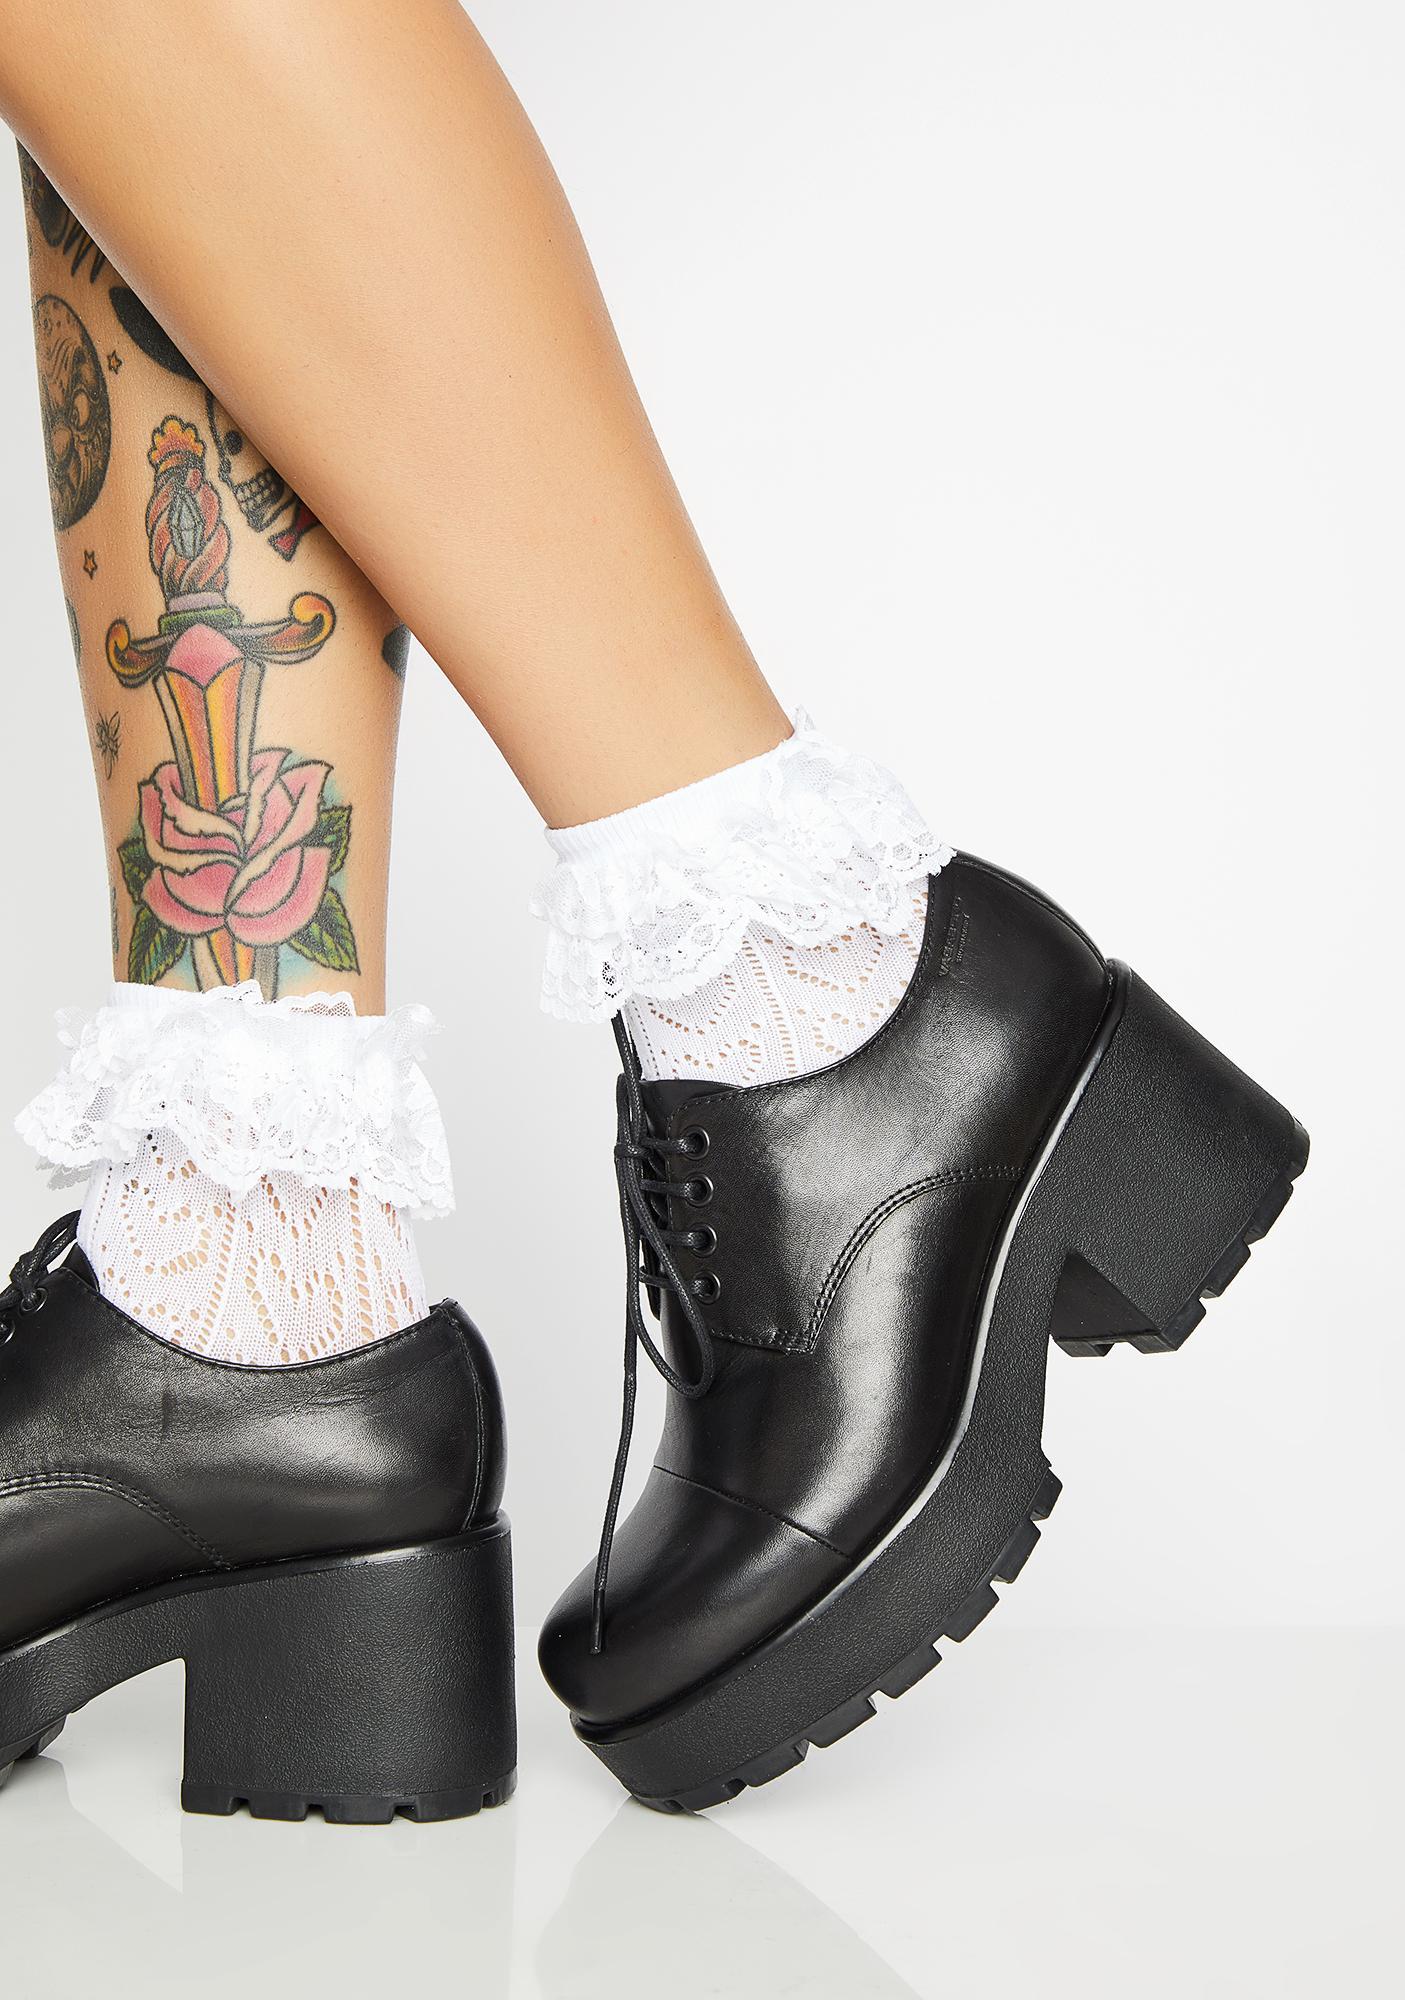 69c414e86 VAGABOND SHOEMAKERS Dioon Leather Platform Oxfords | Dolls Kill